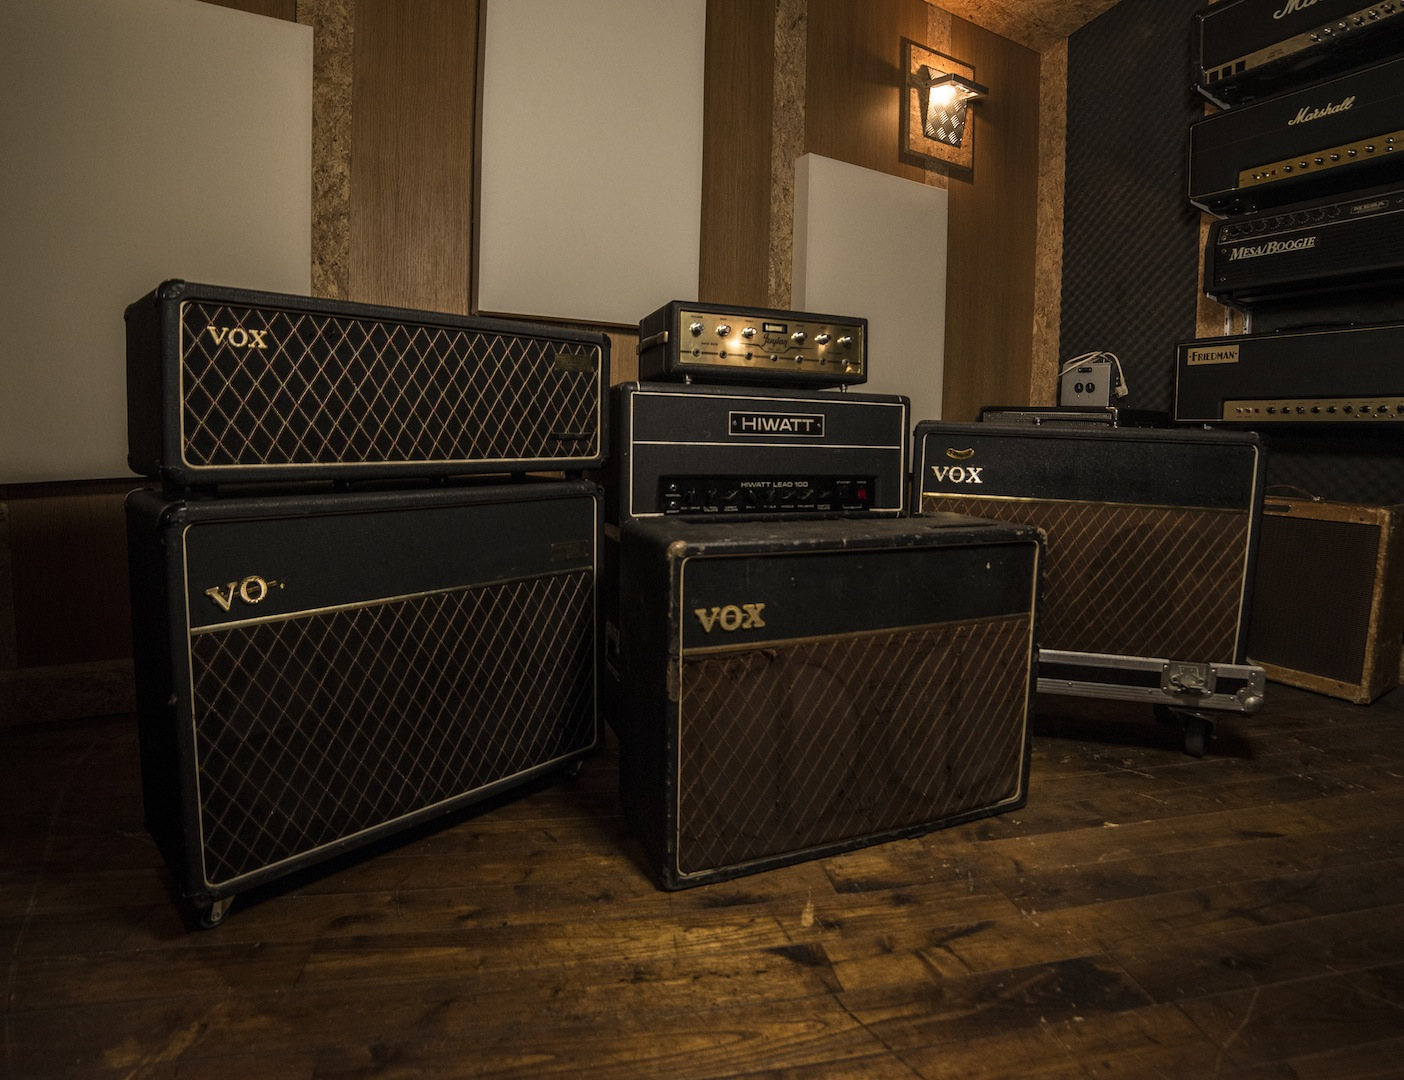 Vox JMI / Hiwatt / Faylon Amps